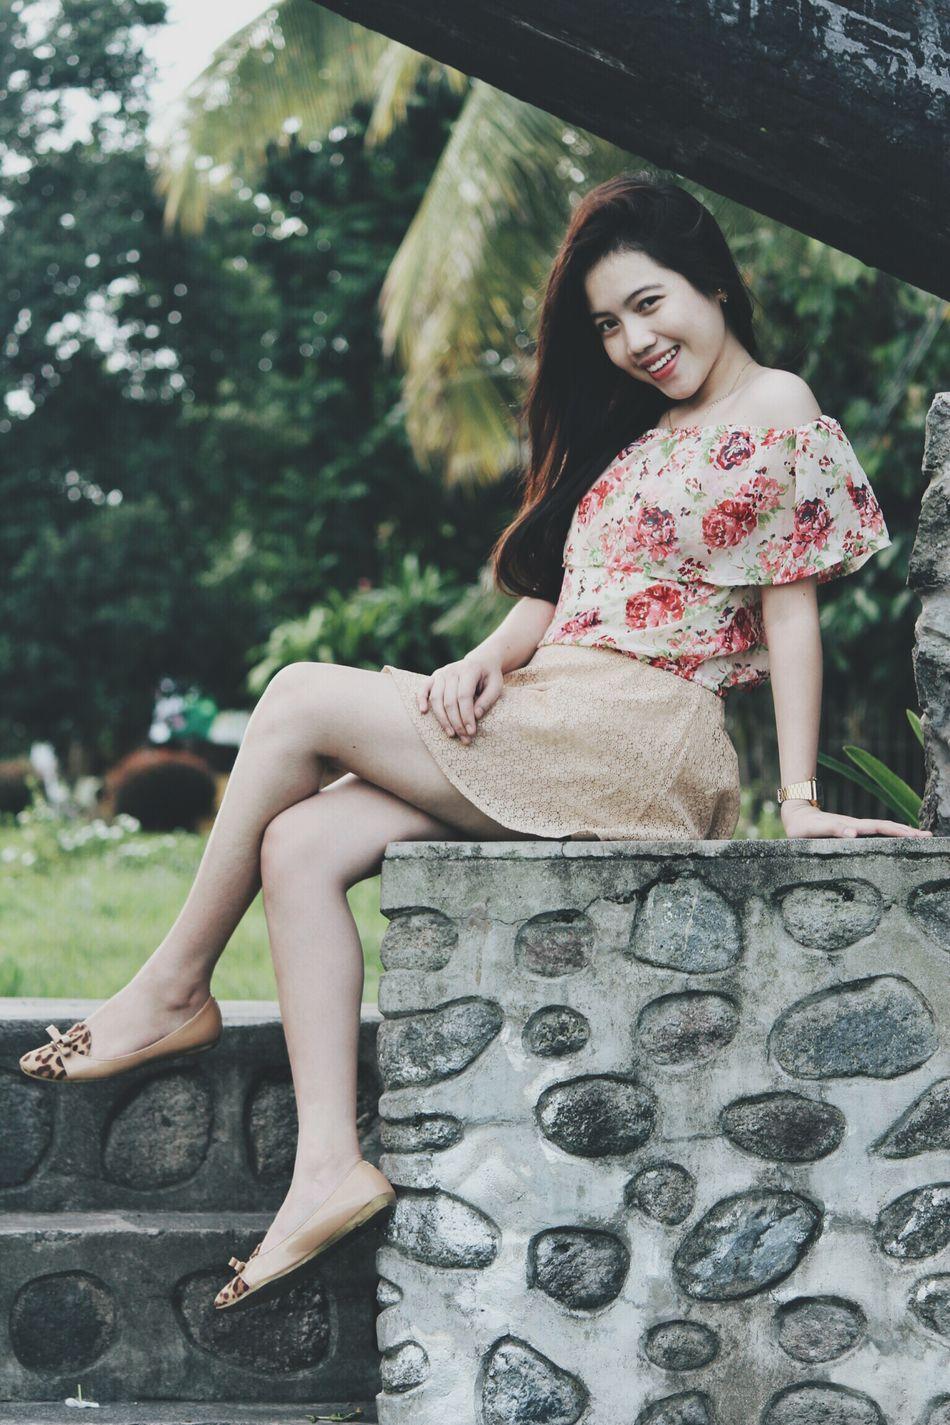 Beautiful Woman Outdoors One Woman Only Sitting Beauty Portrait Cheerful Happiness Filipino Filipina Filipina Beauty Filipino Pride✌ Philippines ❤️ Lovephotography  Cool Photooftheday Prettywoman Bonita